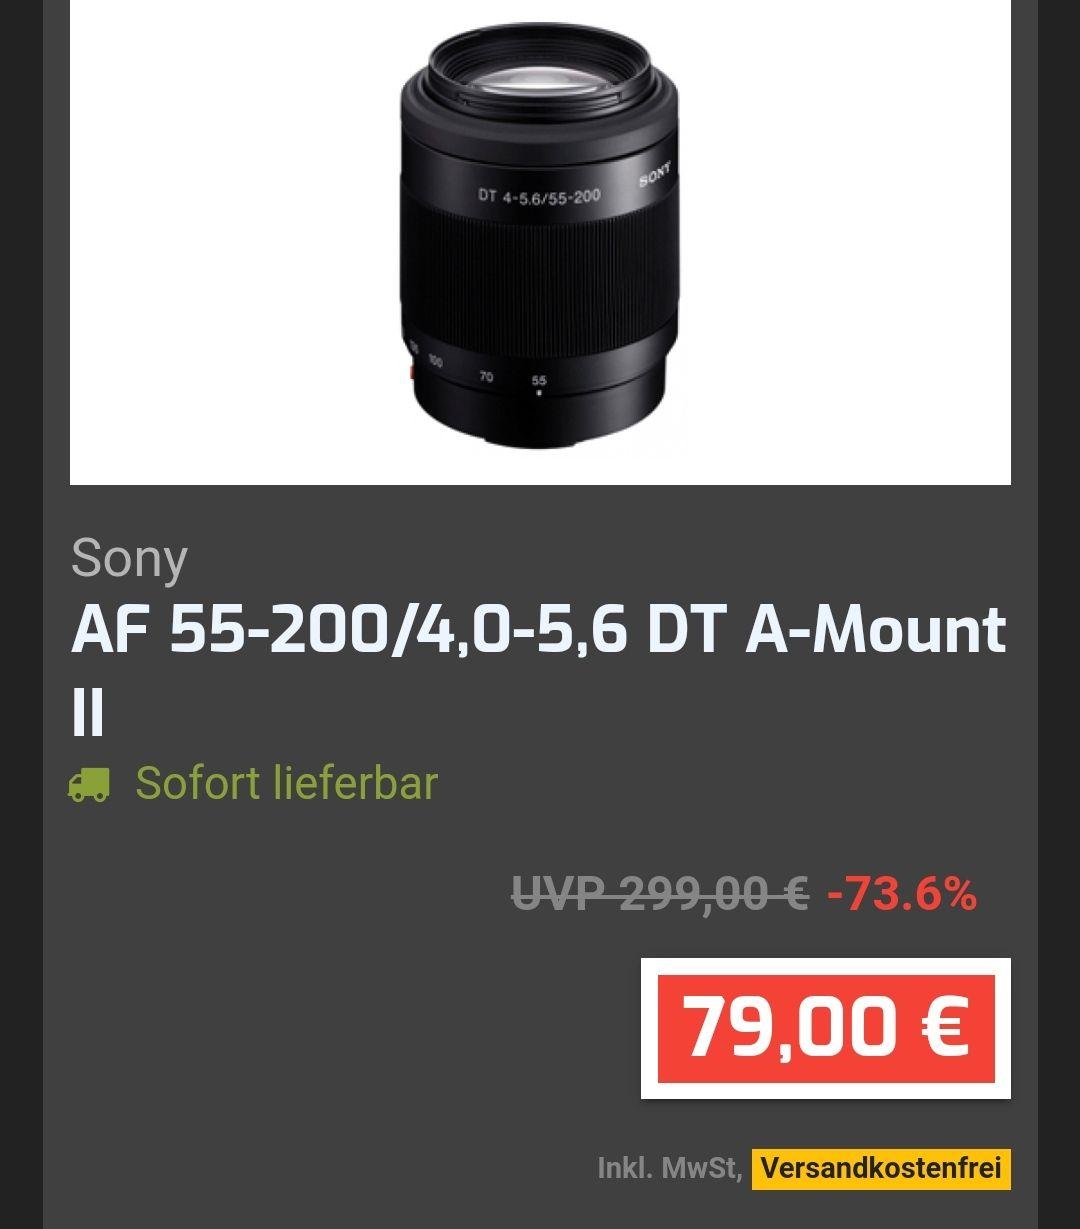 Abverkauf bei Fotoprofi, z.b. Sony AF 55-200/4,0-5,6 DT A-Mount II Objektiv